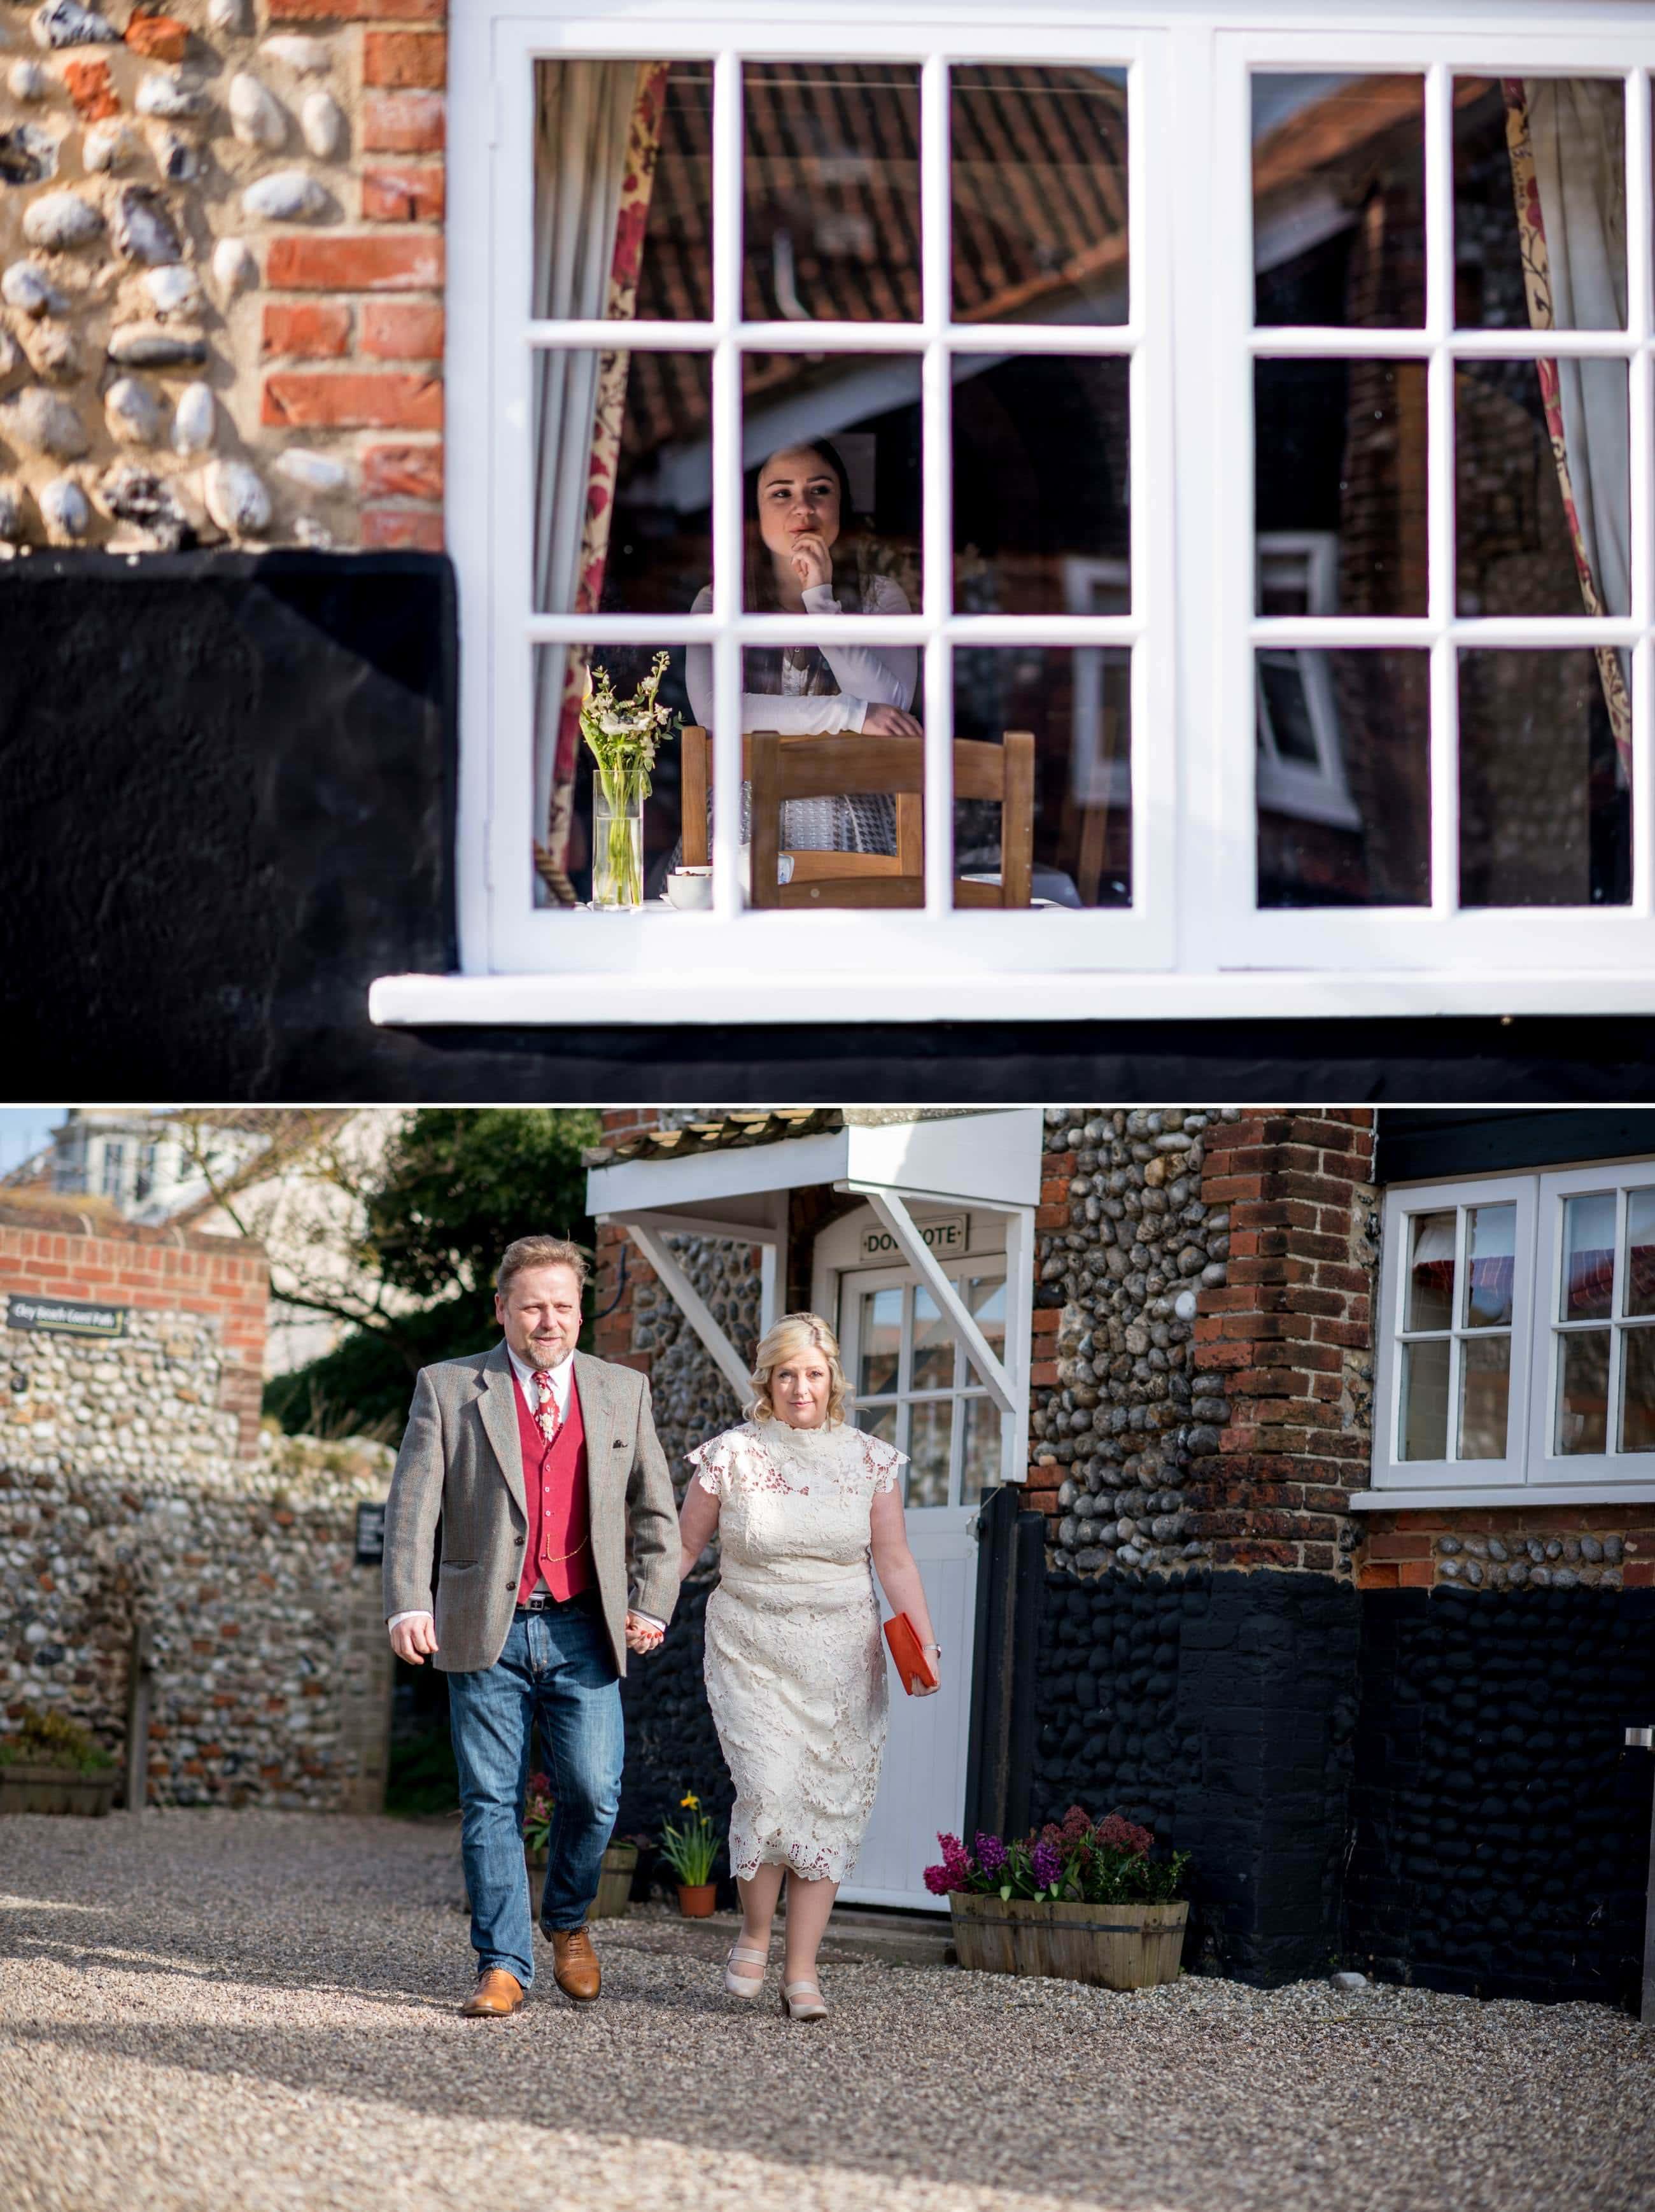 Nicola_Andy_Cley_Windmill_Norfolk_Wedding 5